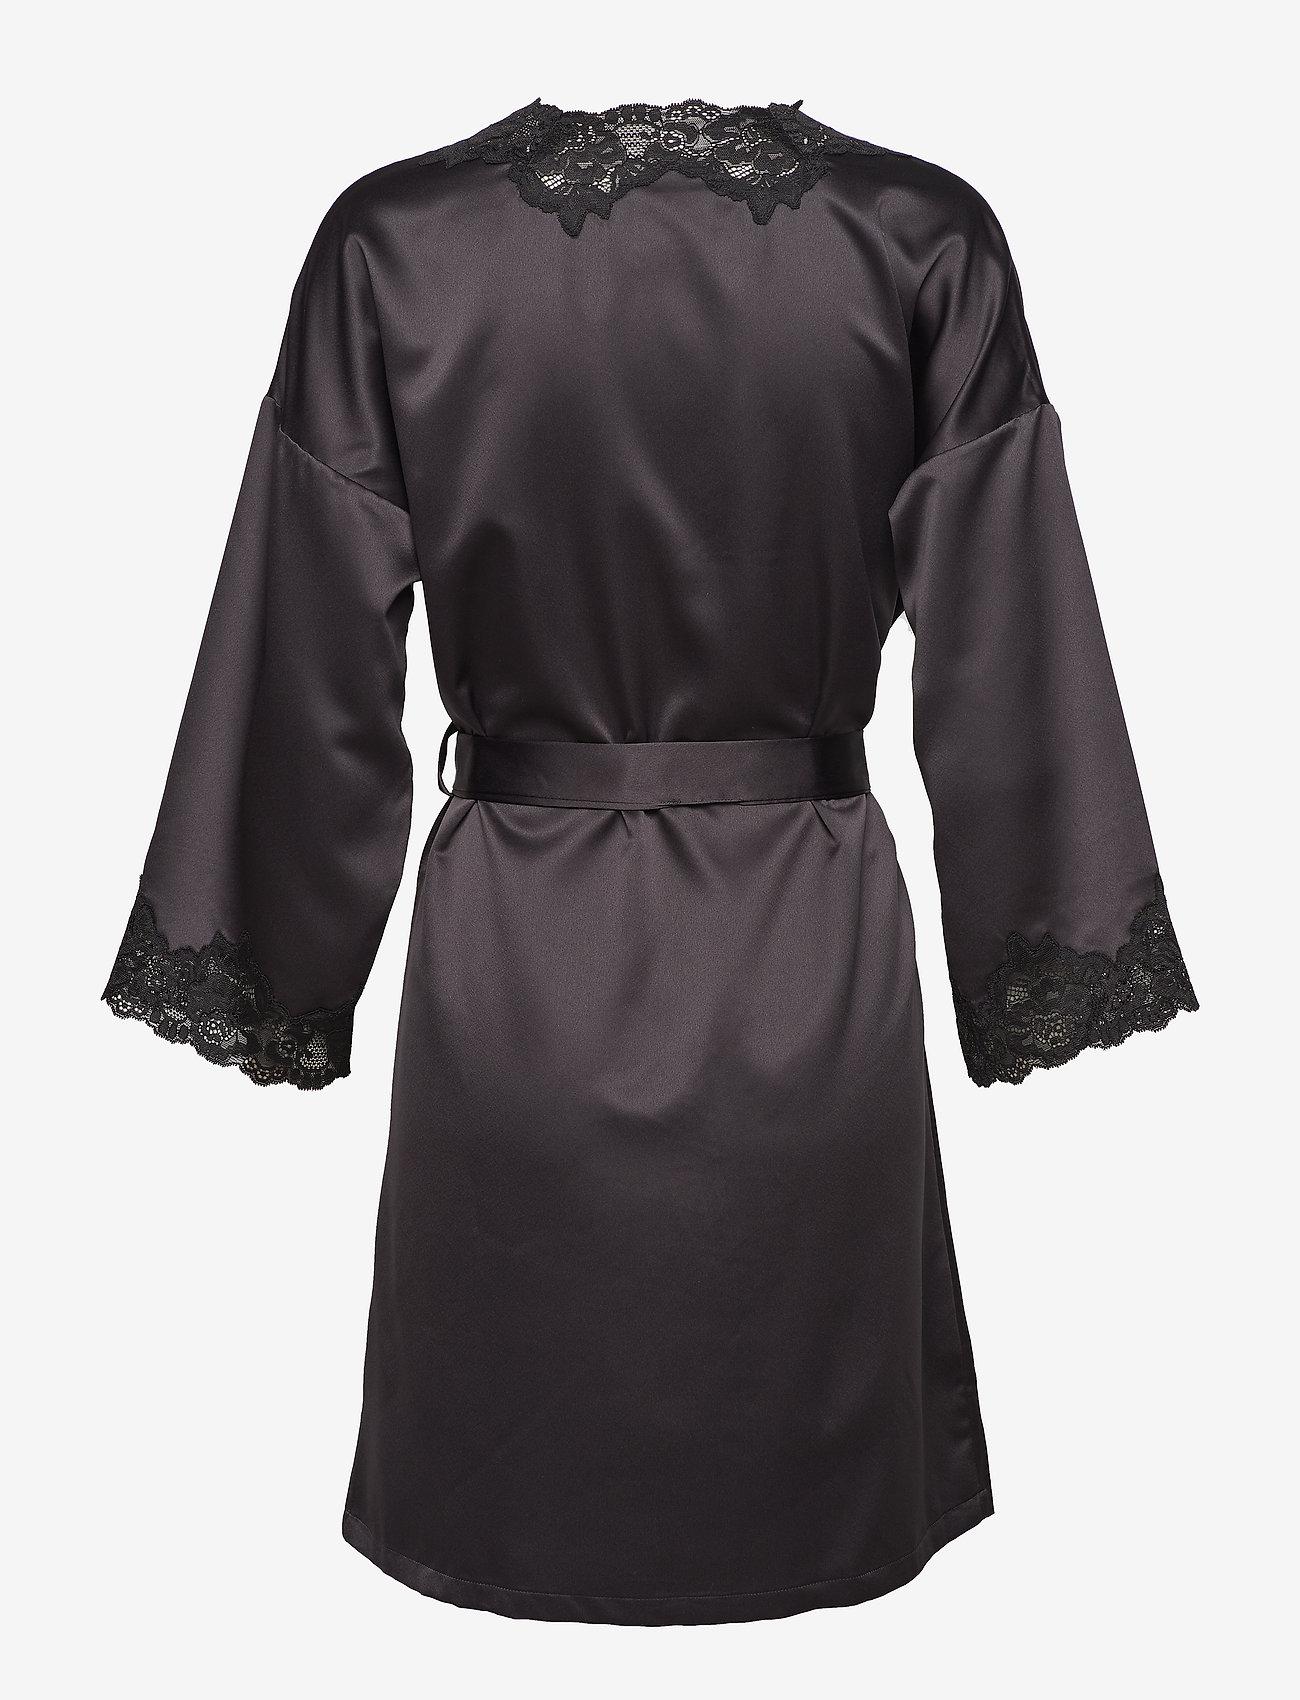 Lrl Signature Lace Kimono Robe 97 Cm Black 119 95 Lauren Ralph Lauren Homewear Boozt Com